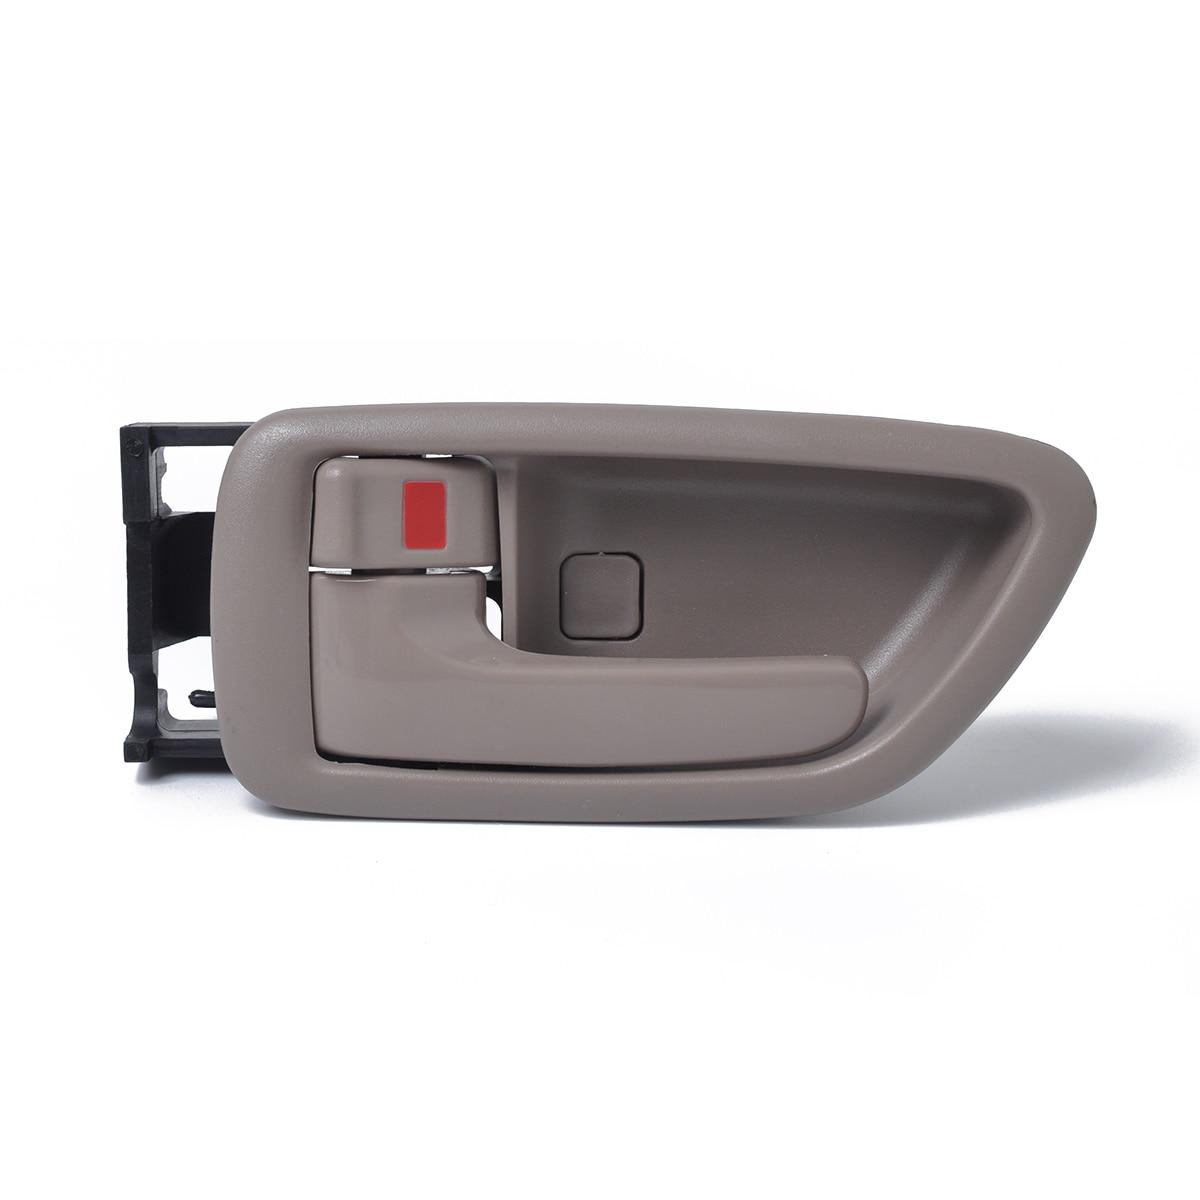 Scion xB Luckmart Door Lock Actuator Front Left Driver Side for Toyota Echo Lexus GS400 GS300 GS430